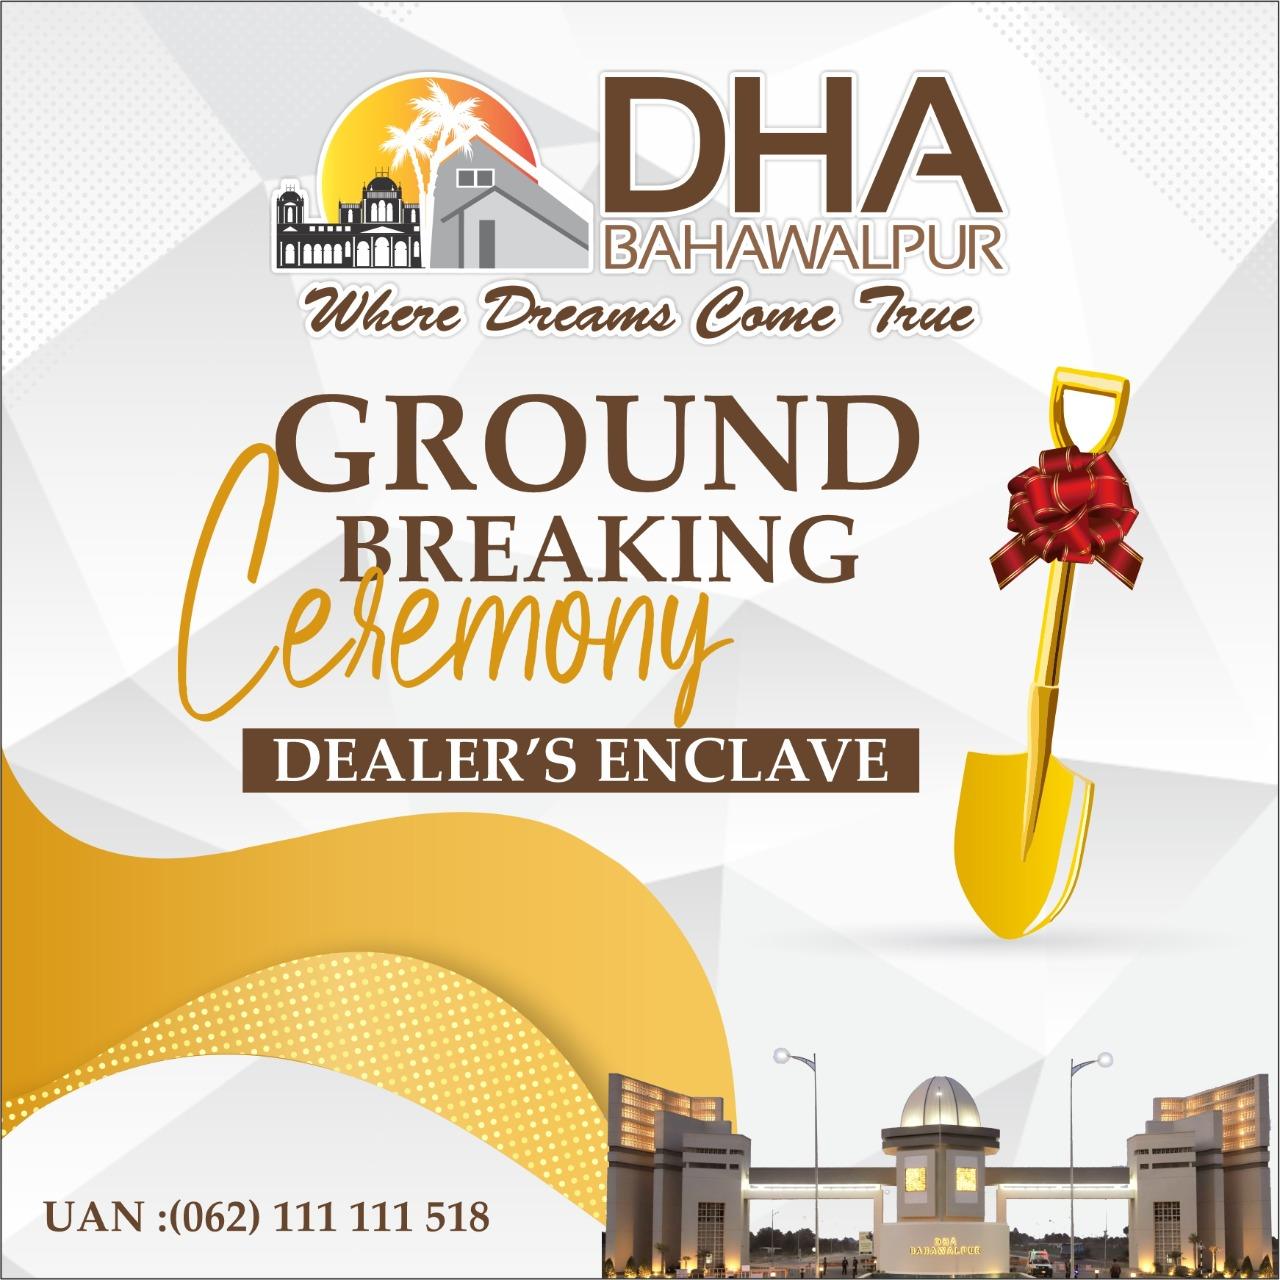 DHA Bahawalpur Ground breaking ceremony dealers enclave